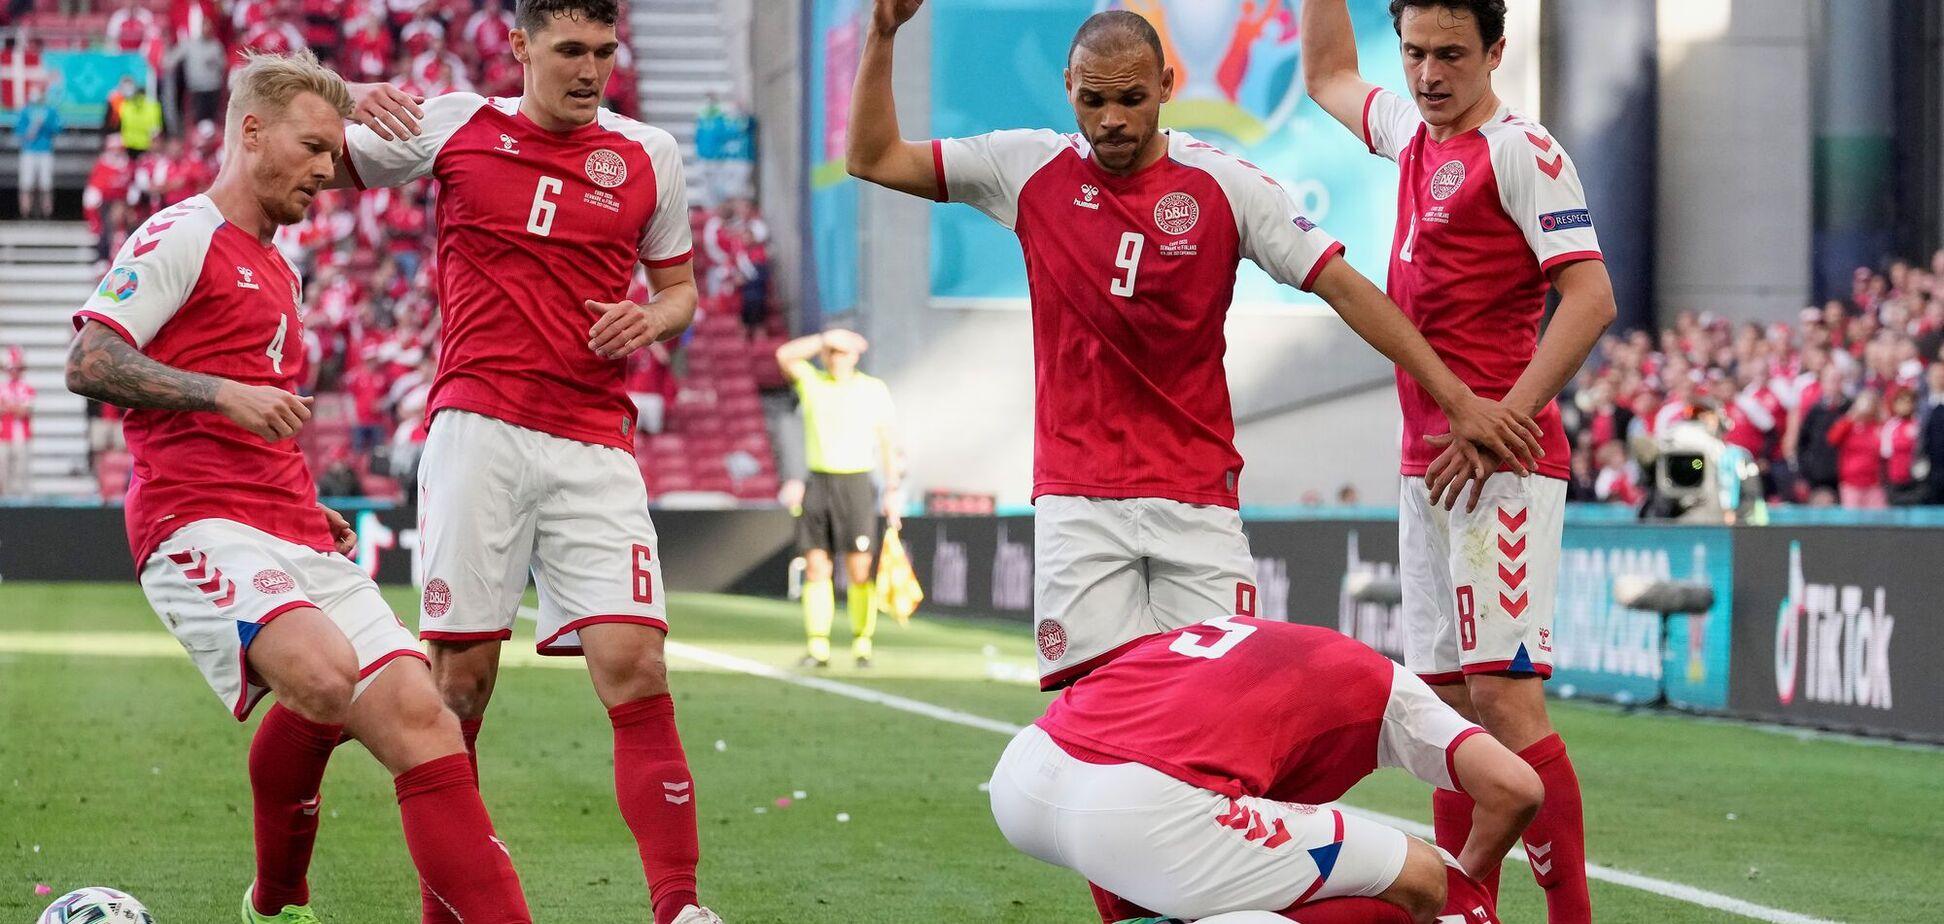 Матч Евро-2020 остановлен из-за реанимации лидера сборной Дании